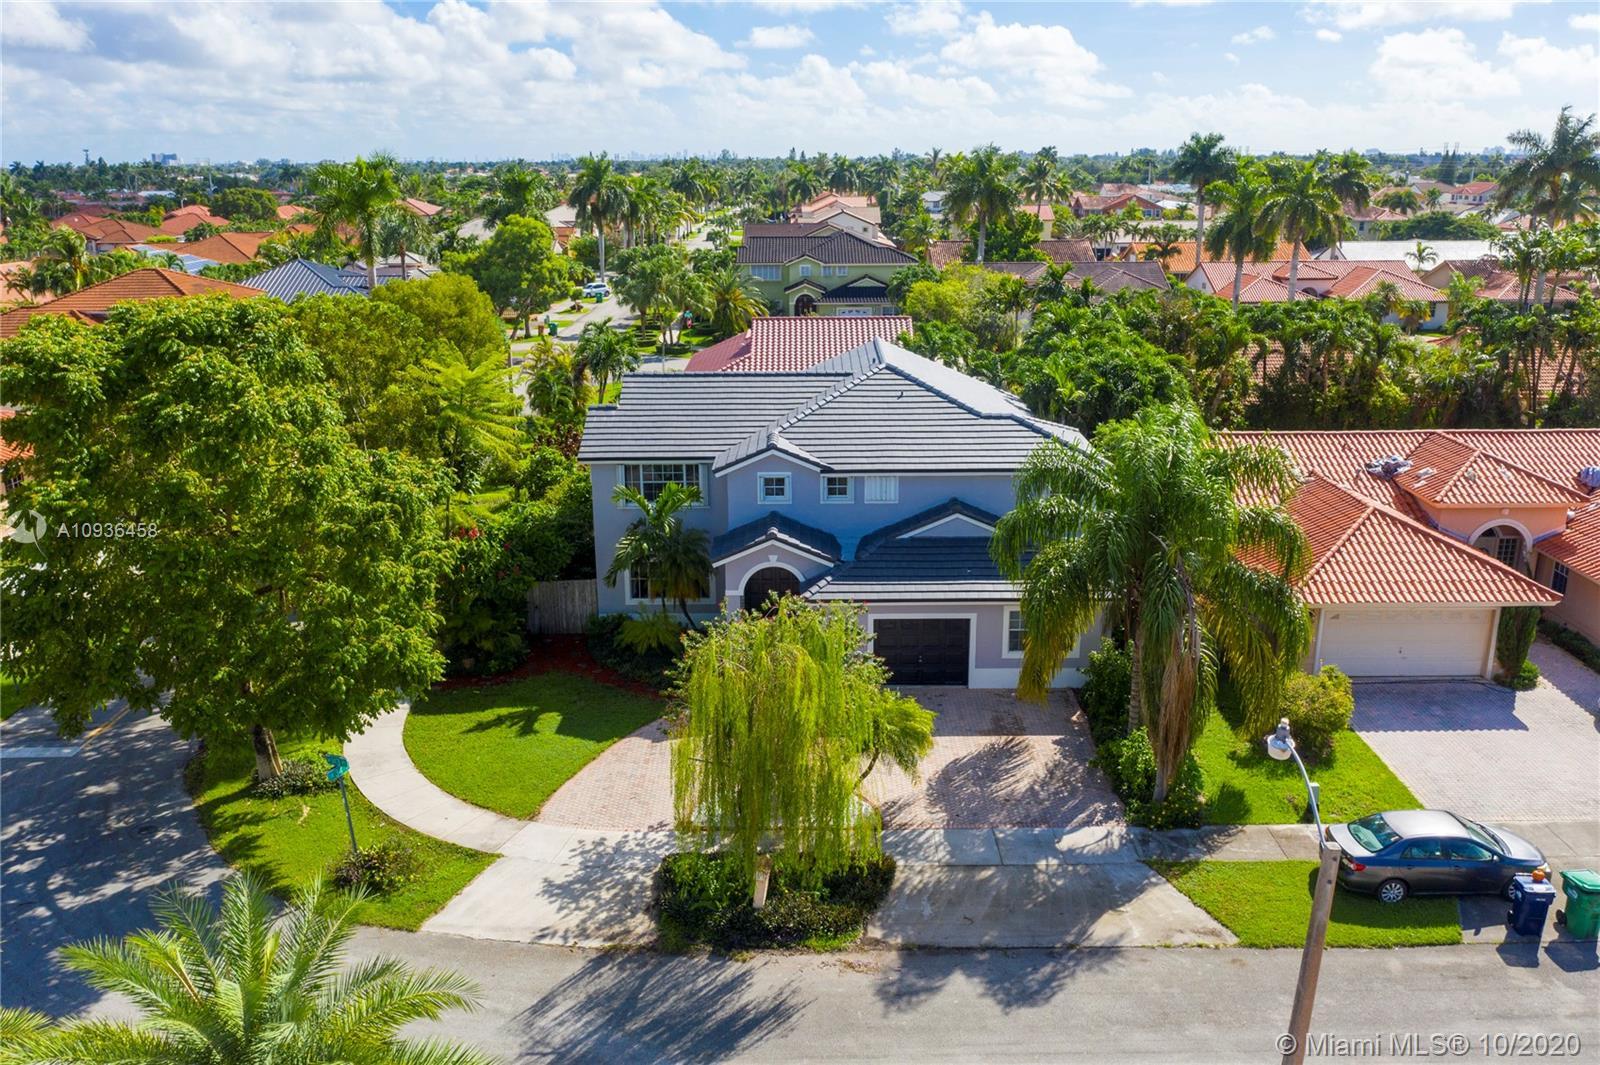 J G Heads Farms - 3401 SW 143rd Pl, Miami, FL 33175